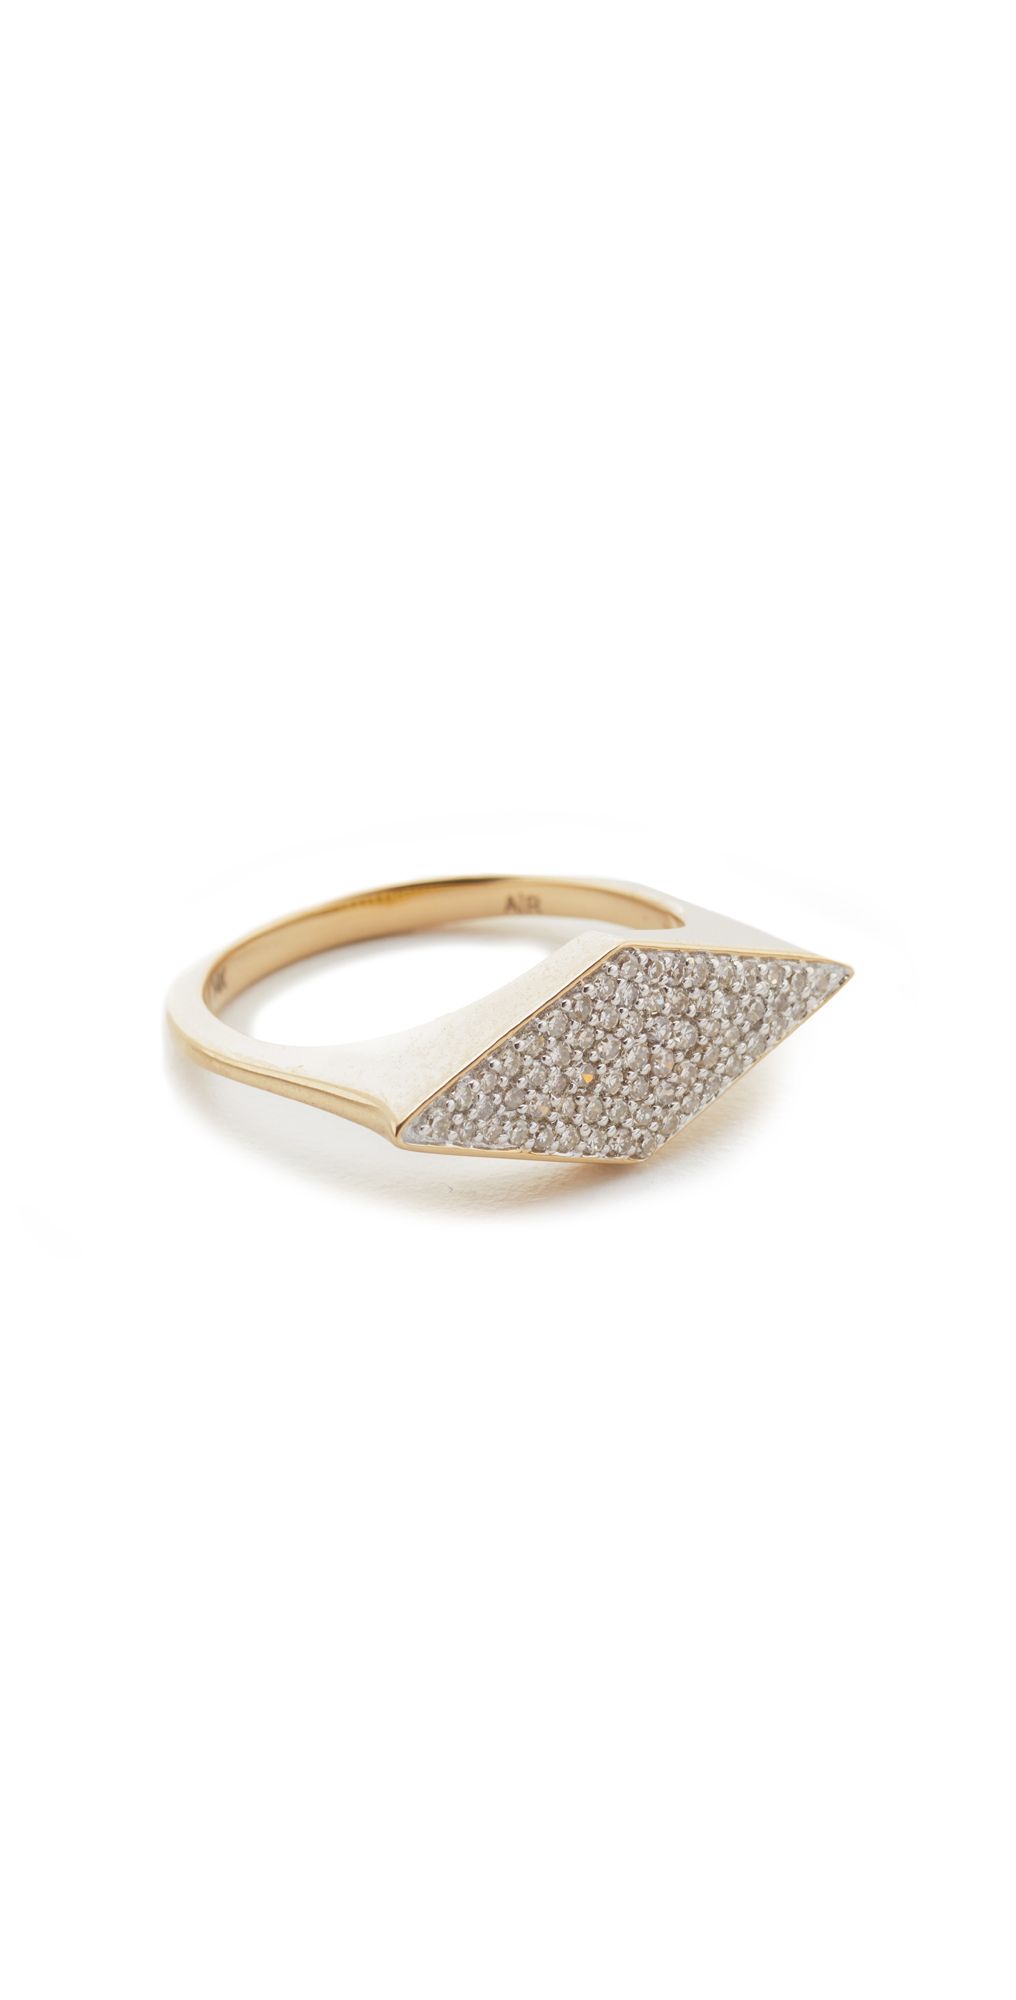 14k Gold Stretched Diamond Signet Ring Adina Reyter